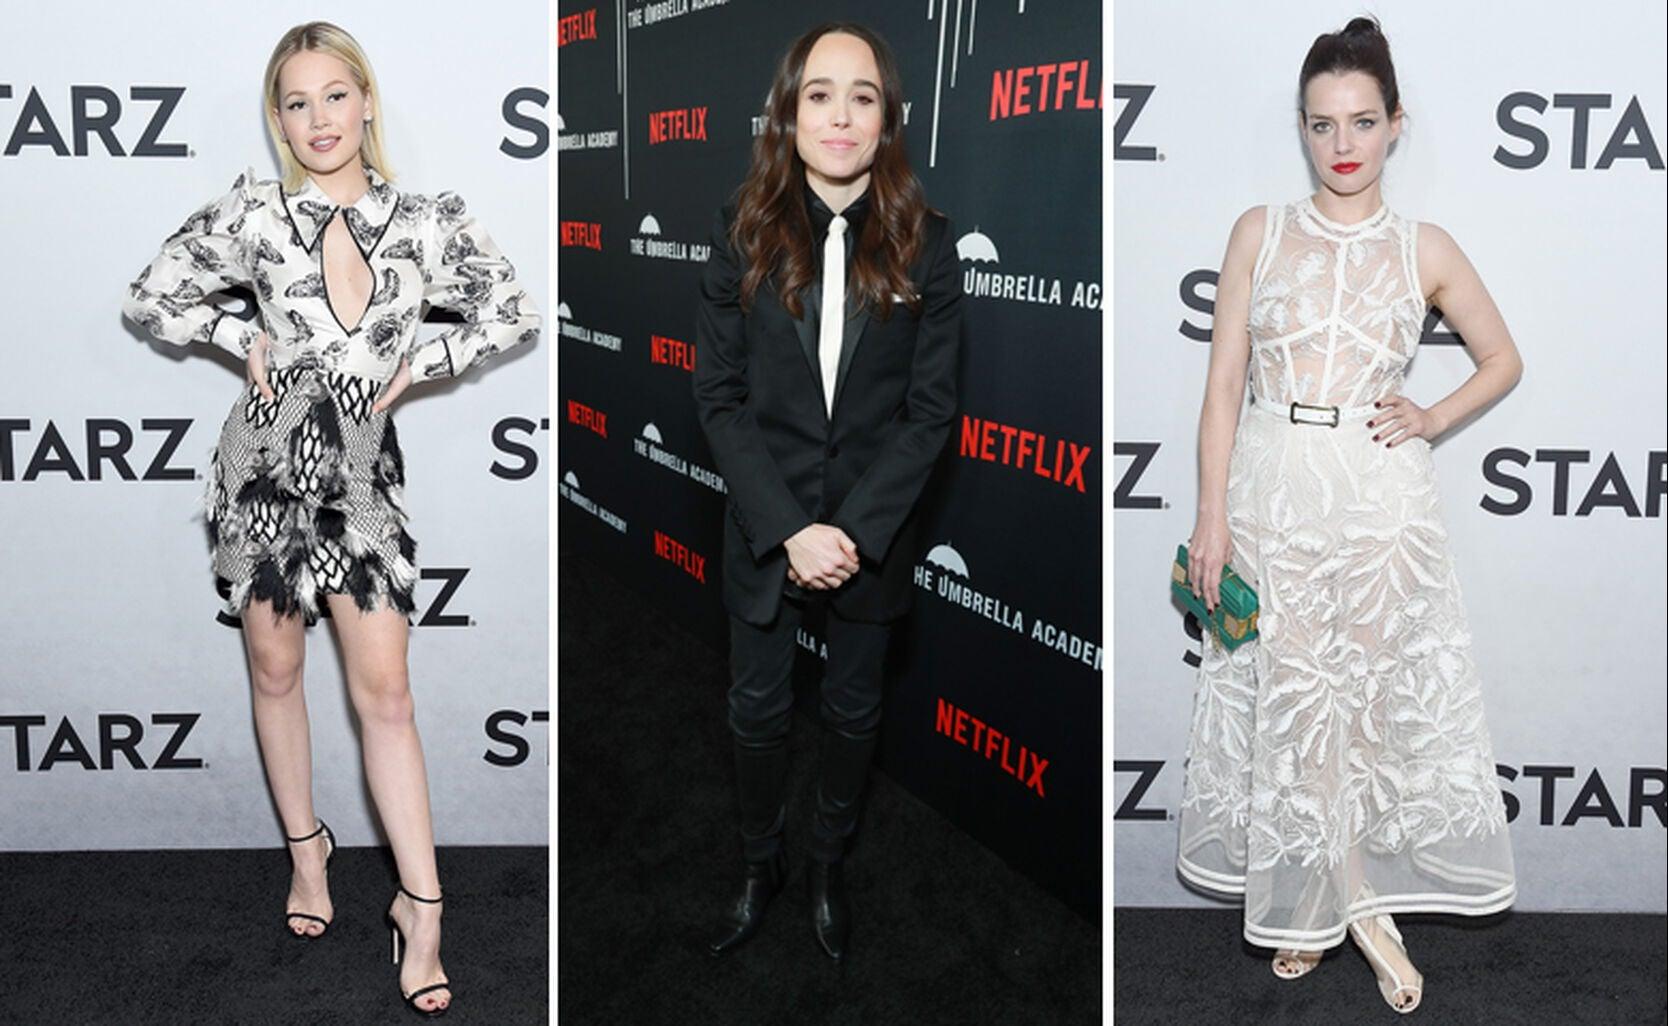 Kelli Berglund, Ellen Page, Roxane Mesquida